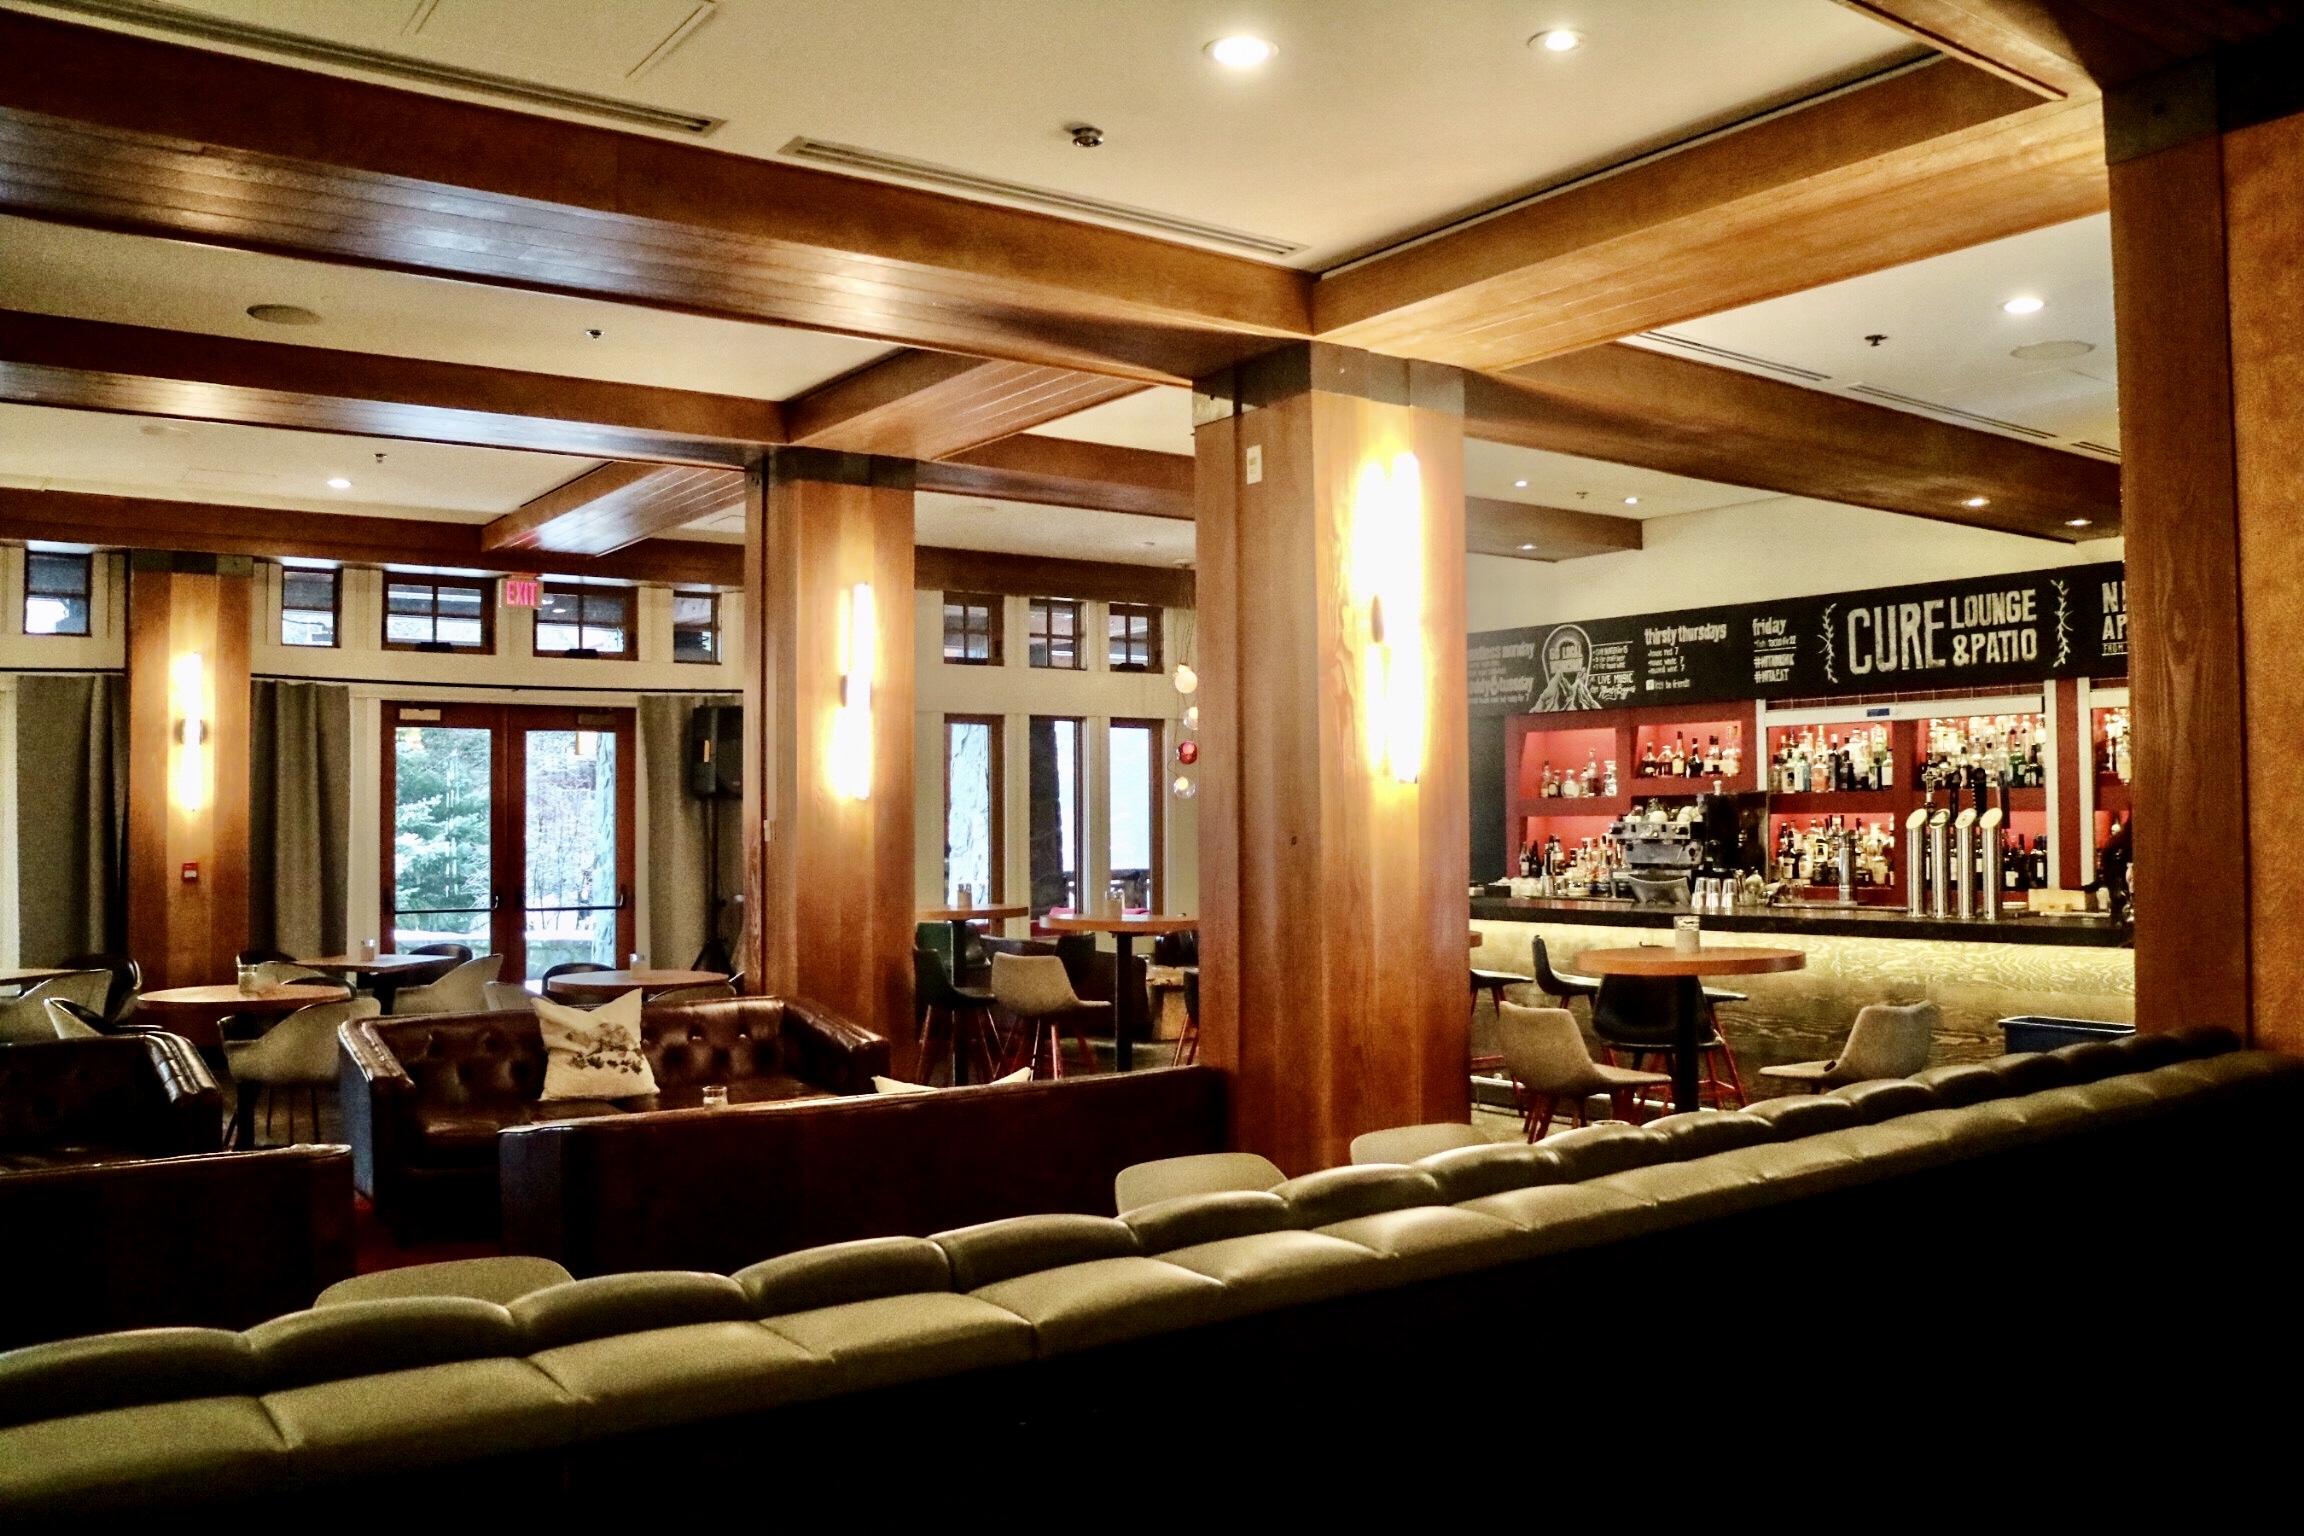 Cure Lounge @ Nita Lake Lodge